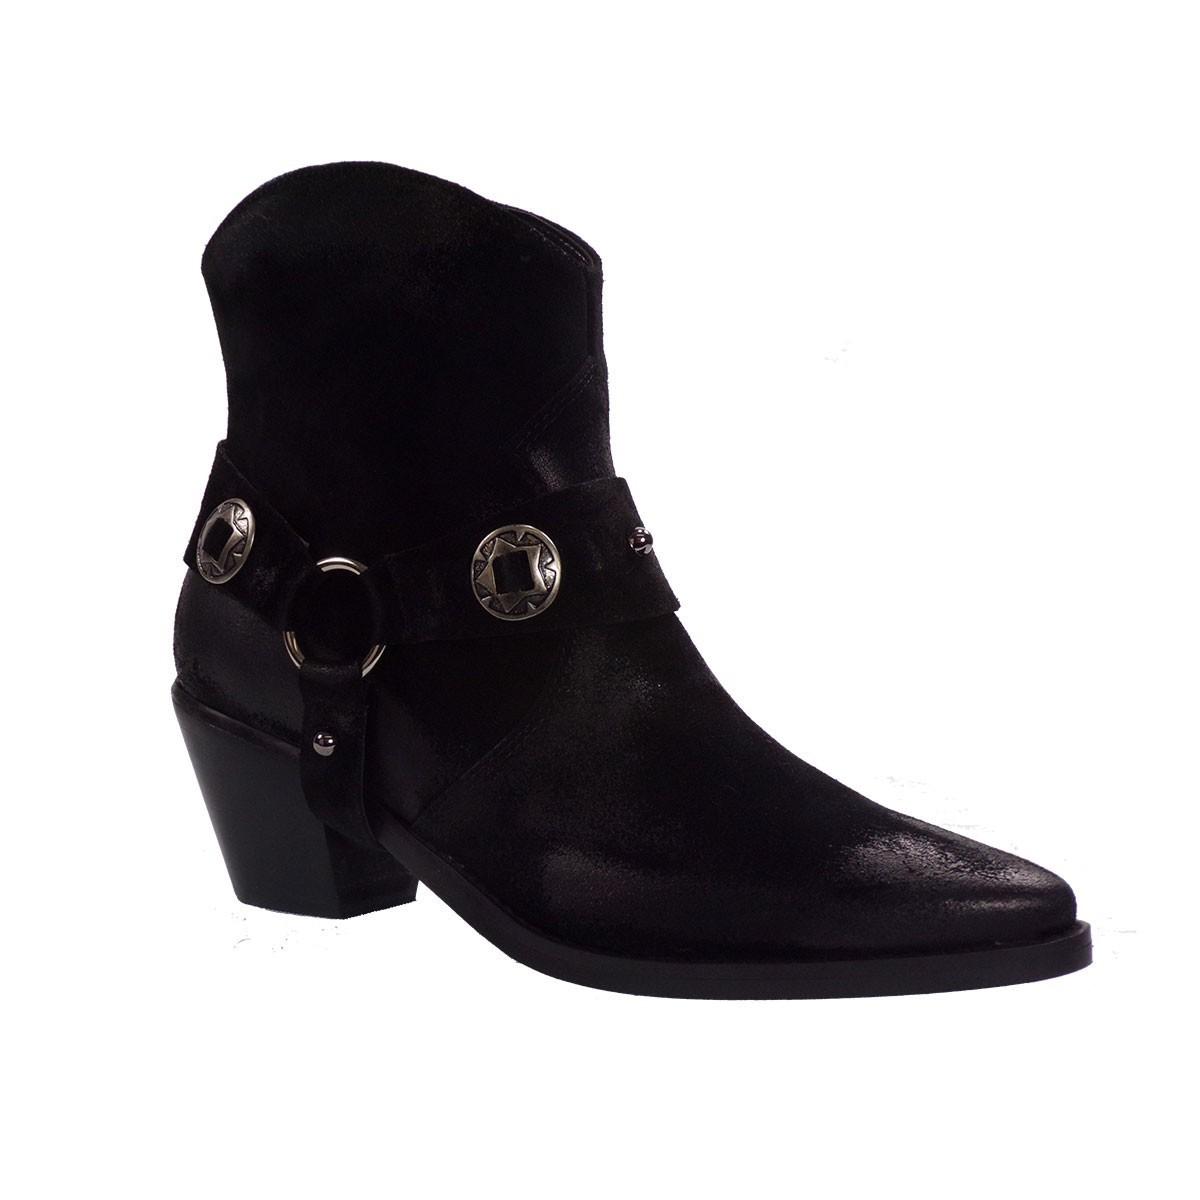 Fardoulis Shoes Γυναικεία Παπούτσια Μποτάκια 4211 Μαύρο